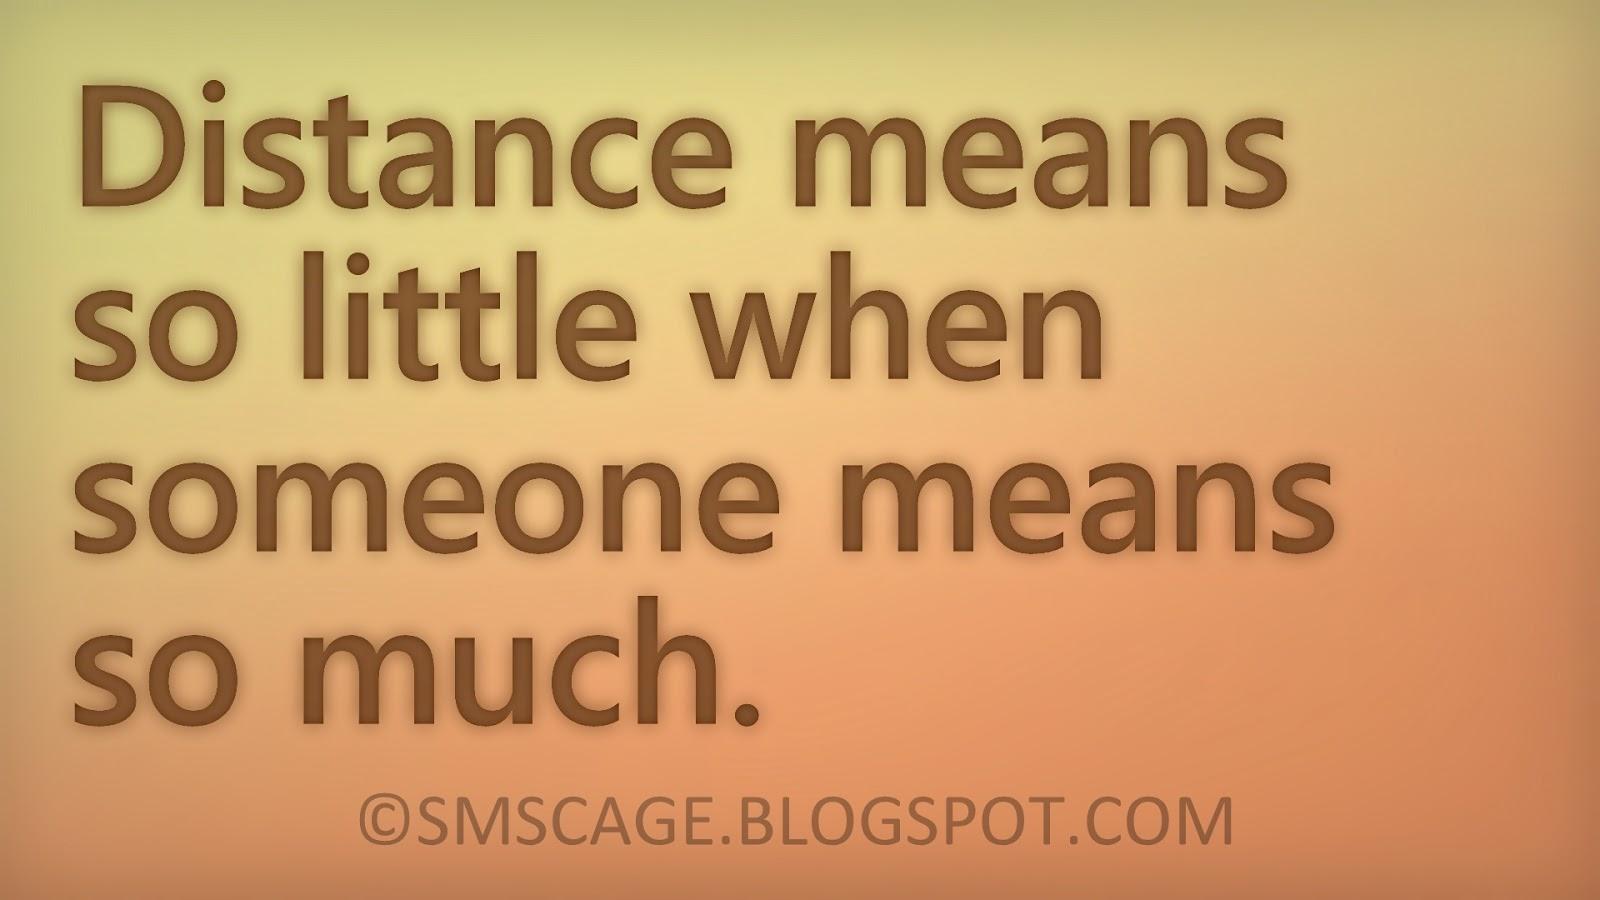 long distance relationship tumblr blogs